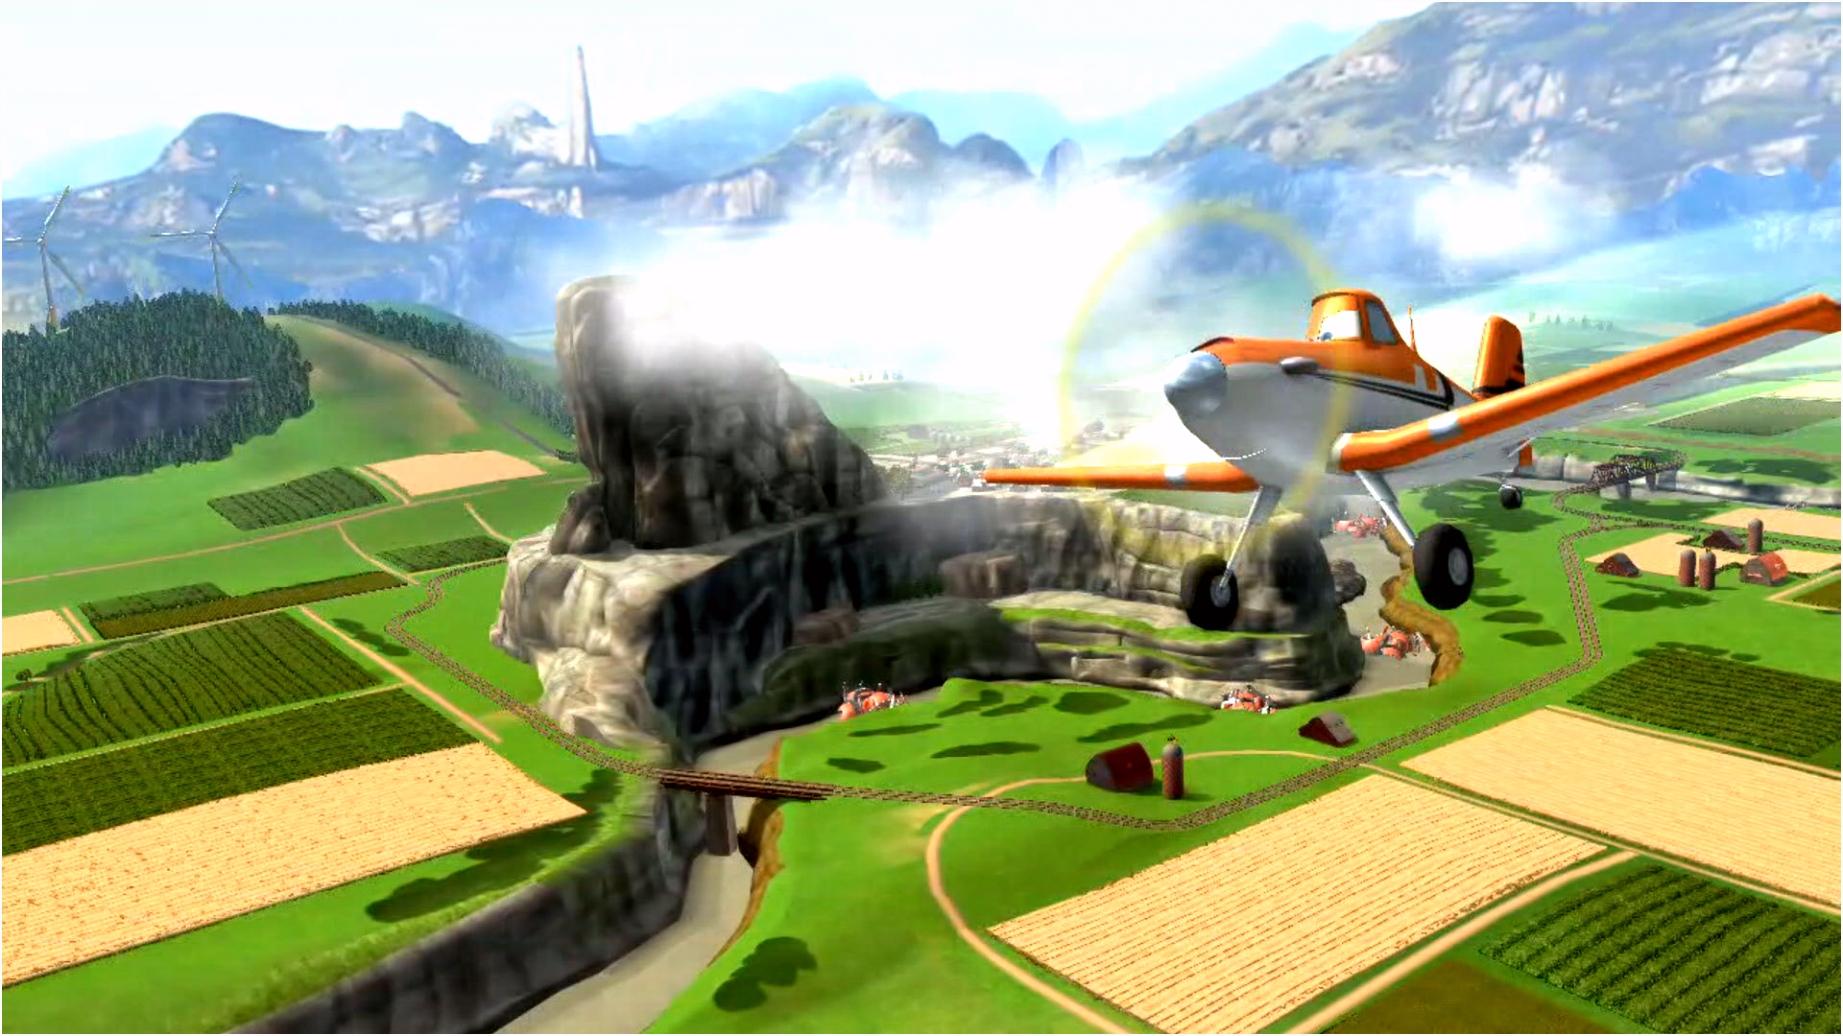 Disney Planes Video Game